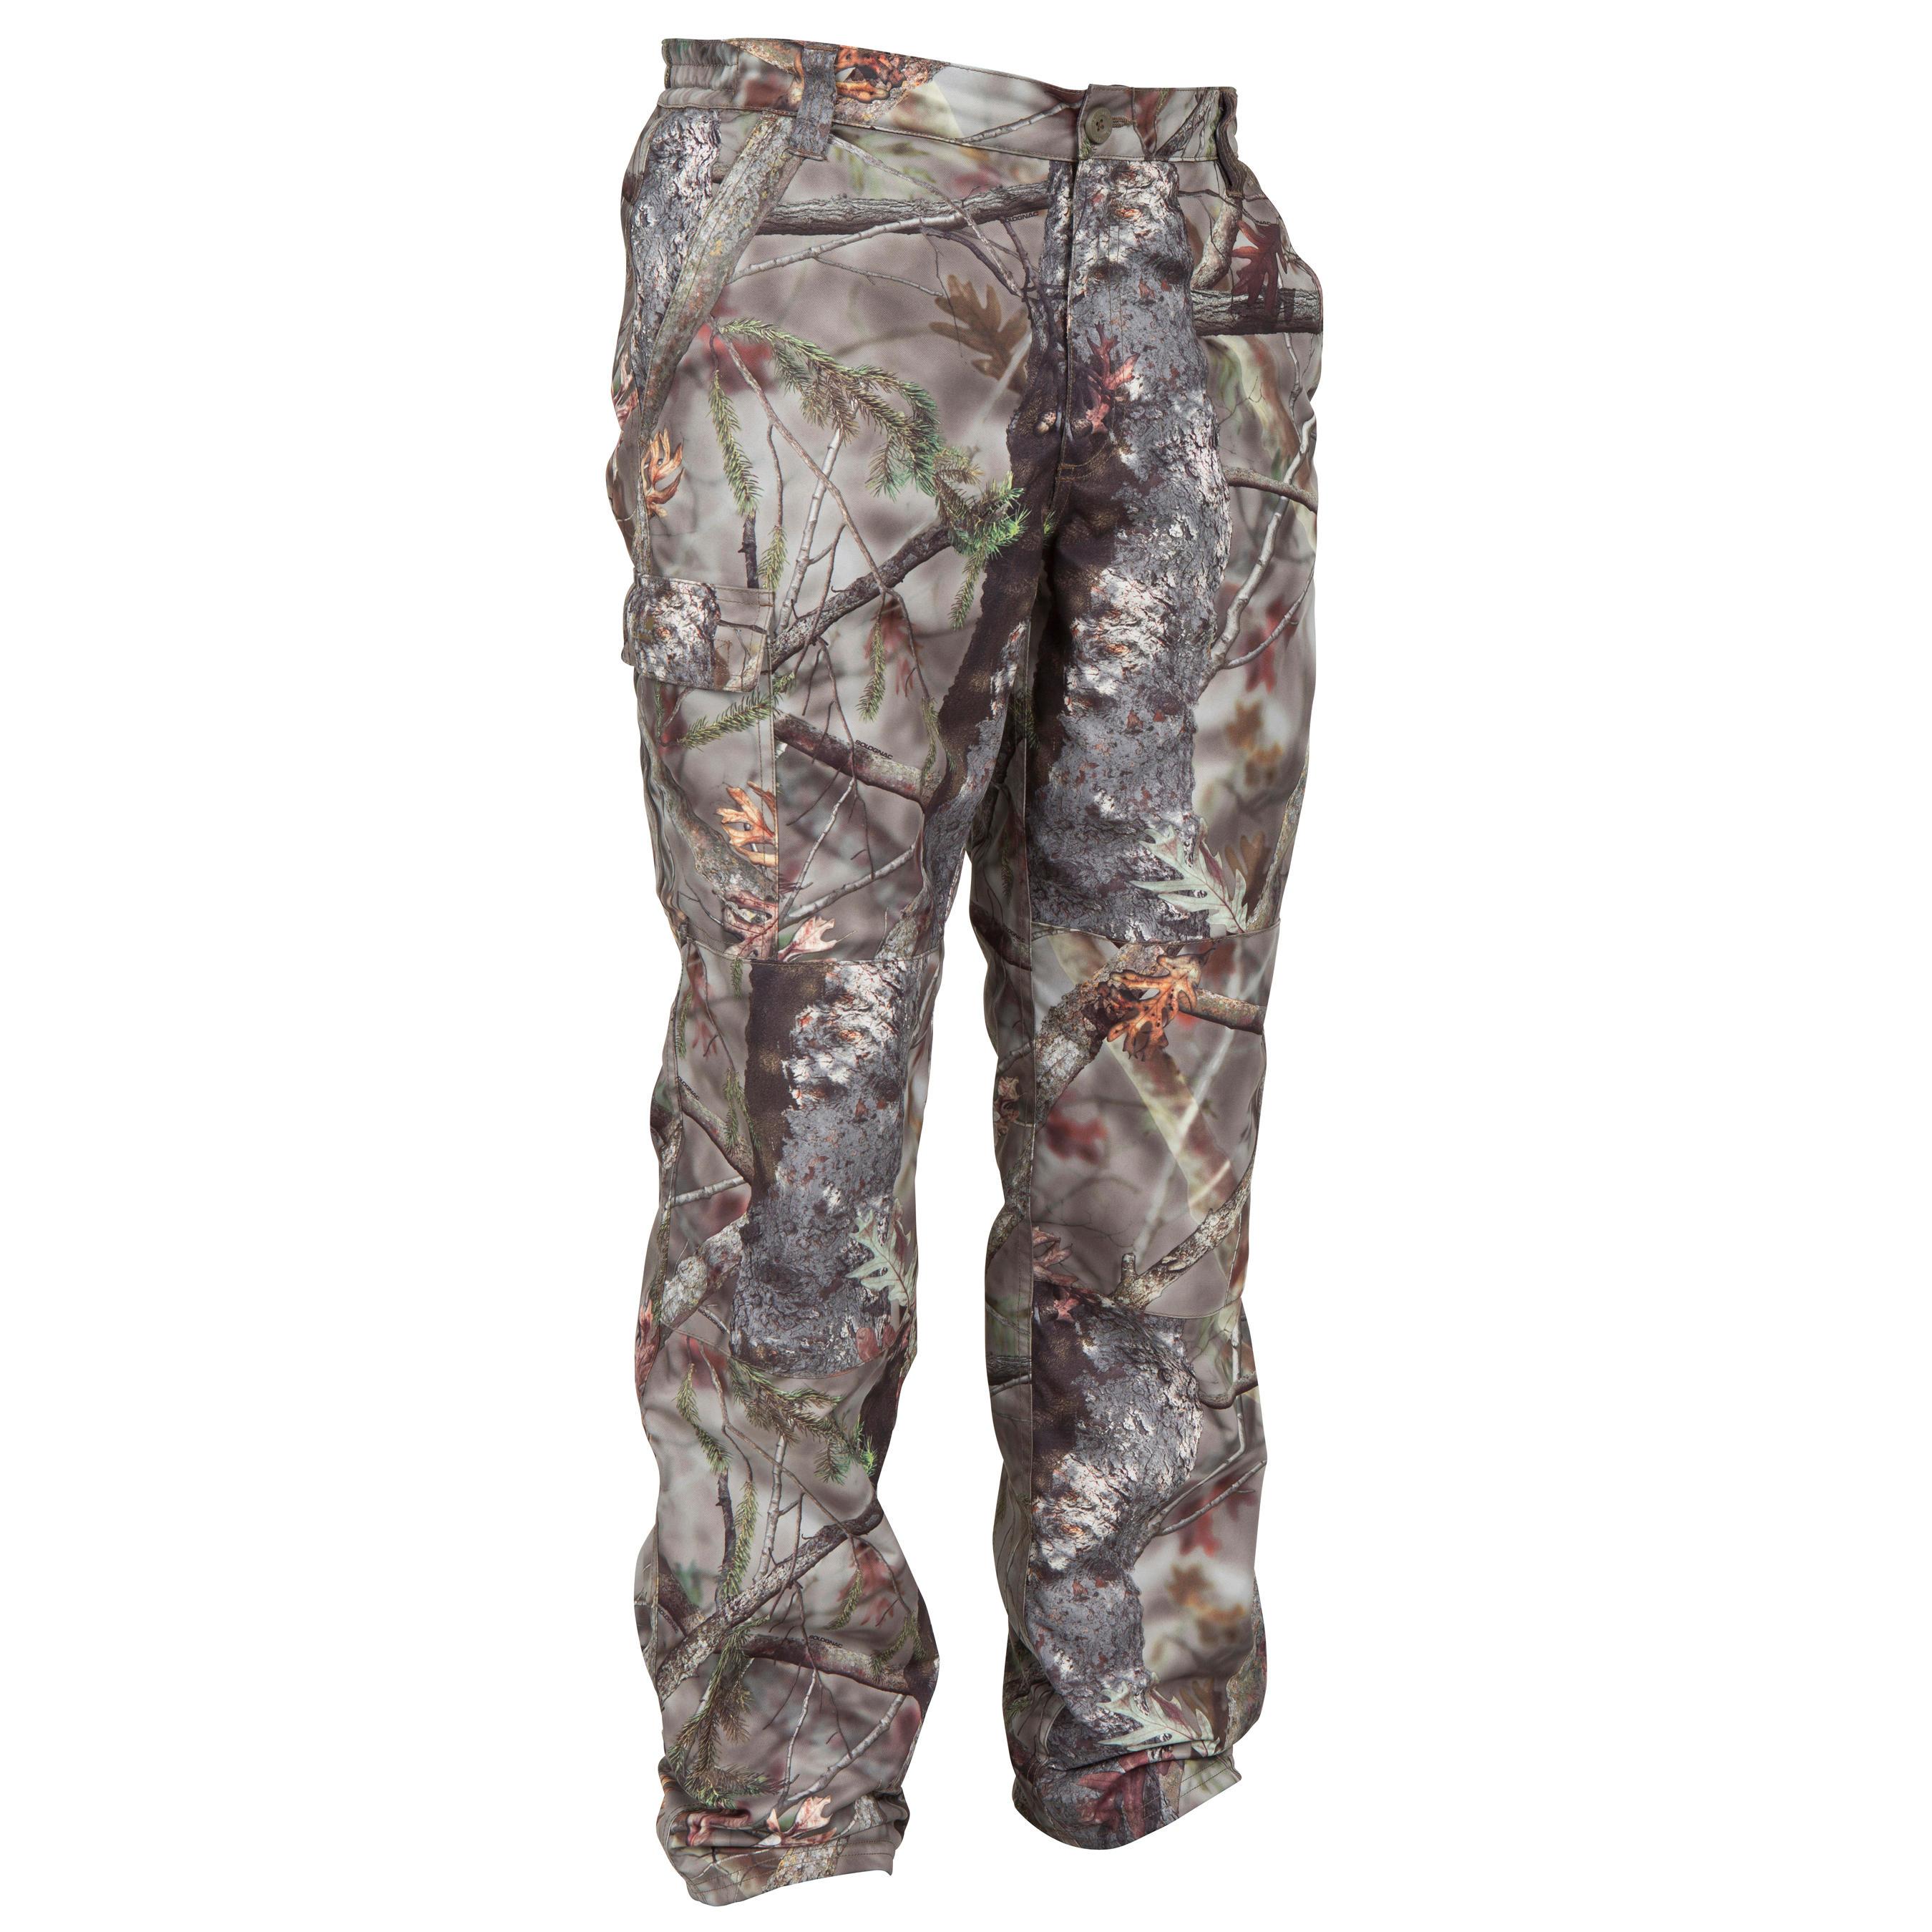 Herren Jagd-Regenhose Posikam 100 Camouflage braun | 03583788473602